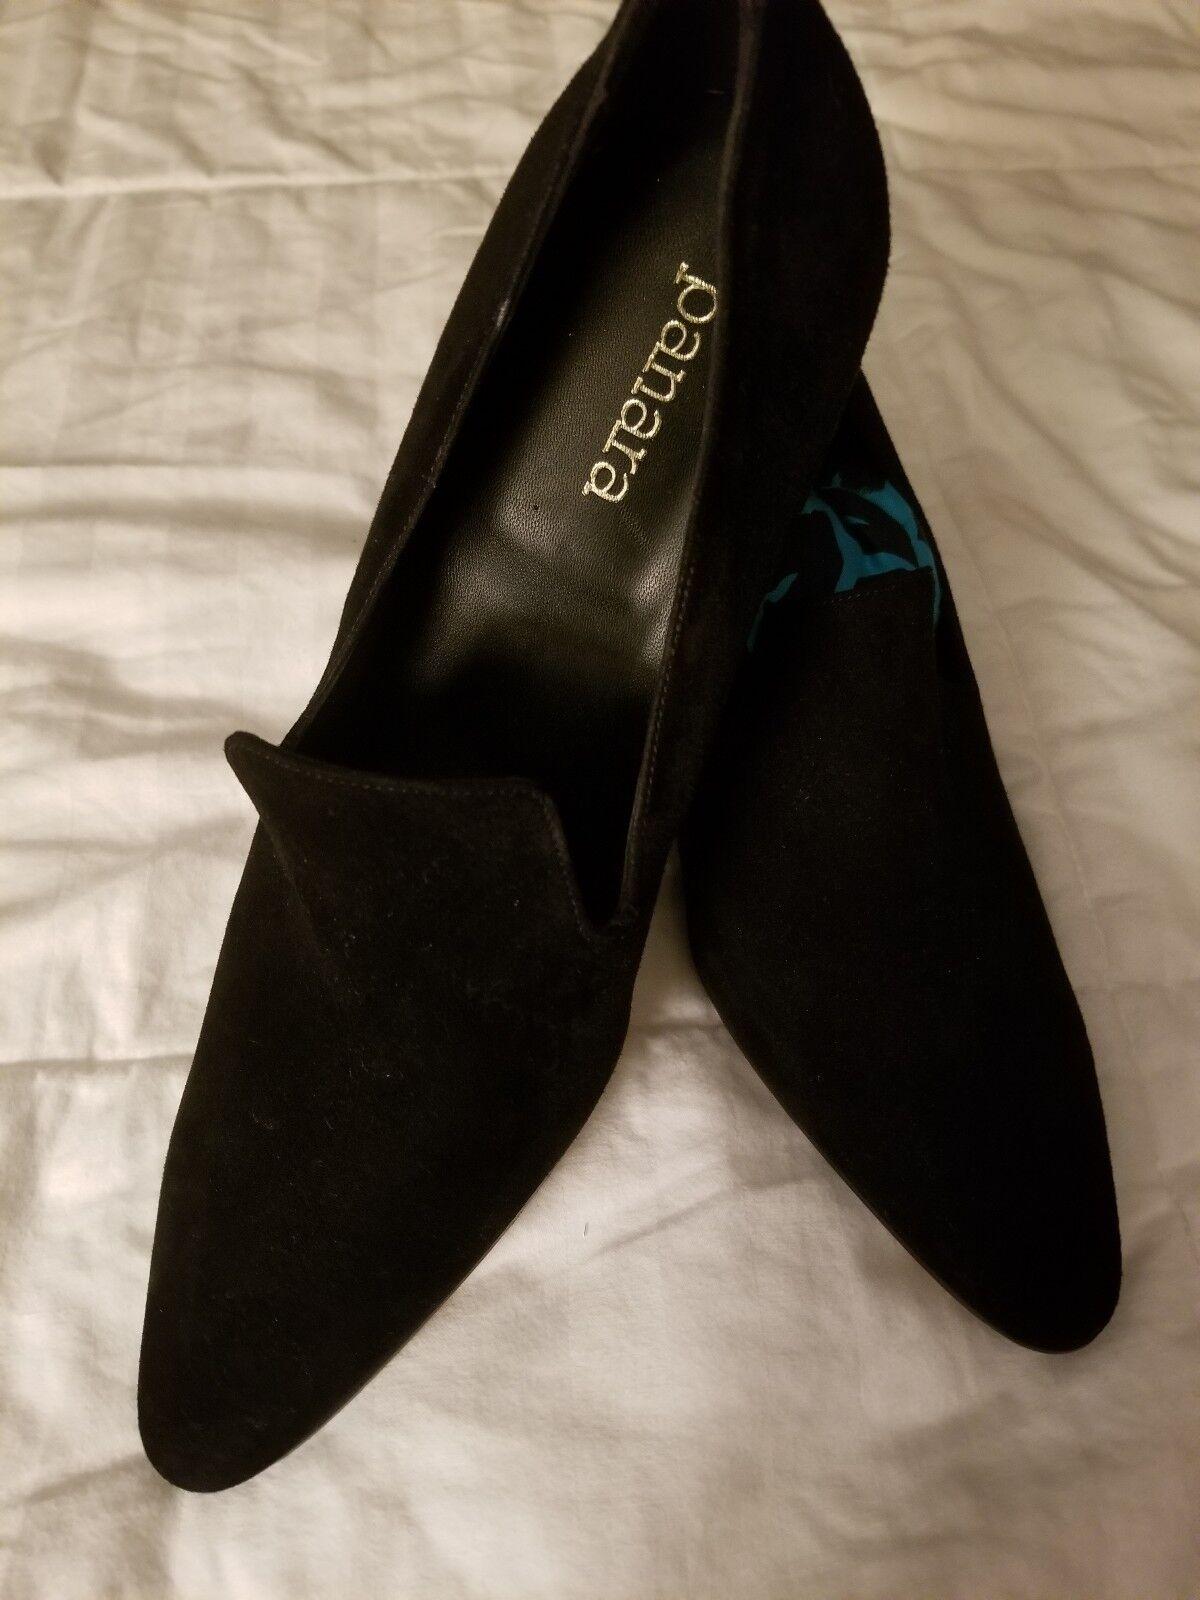 Panara Italy Suede stivaliie Made Heels Size 39 Made stivaliie In Italy Panara 1dc0f5   ad15ec